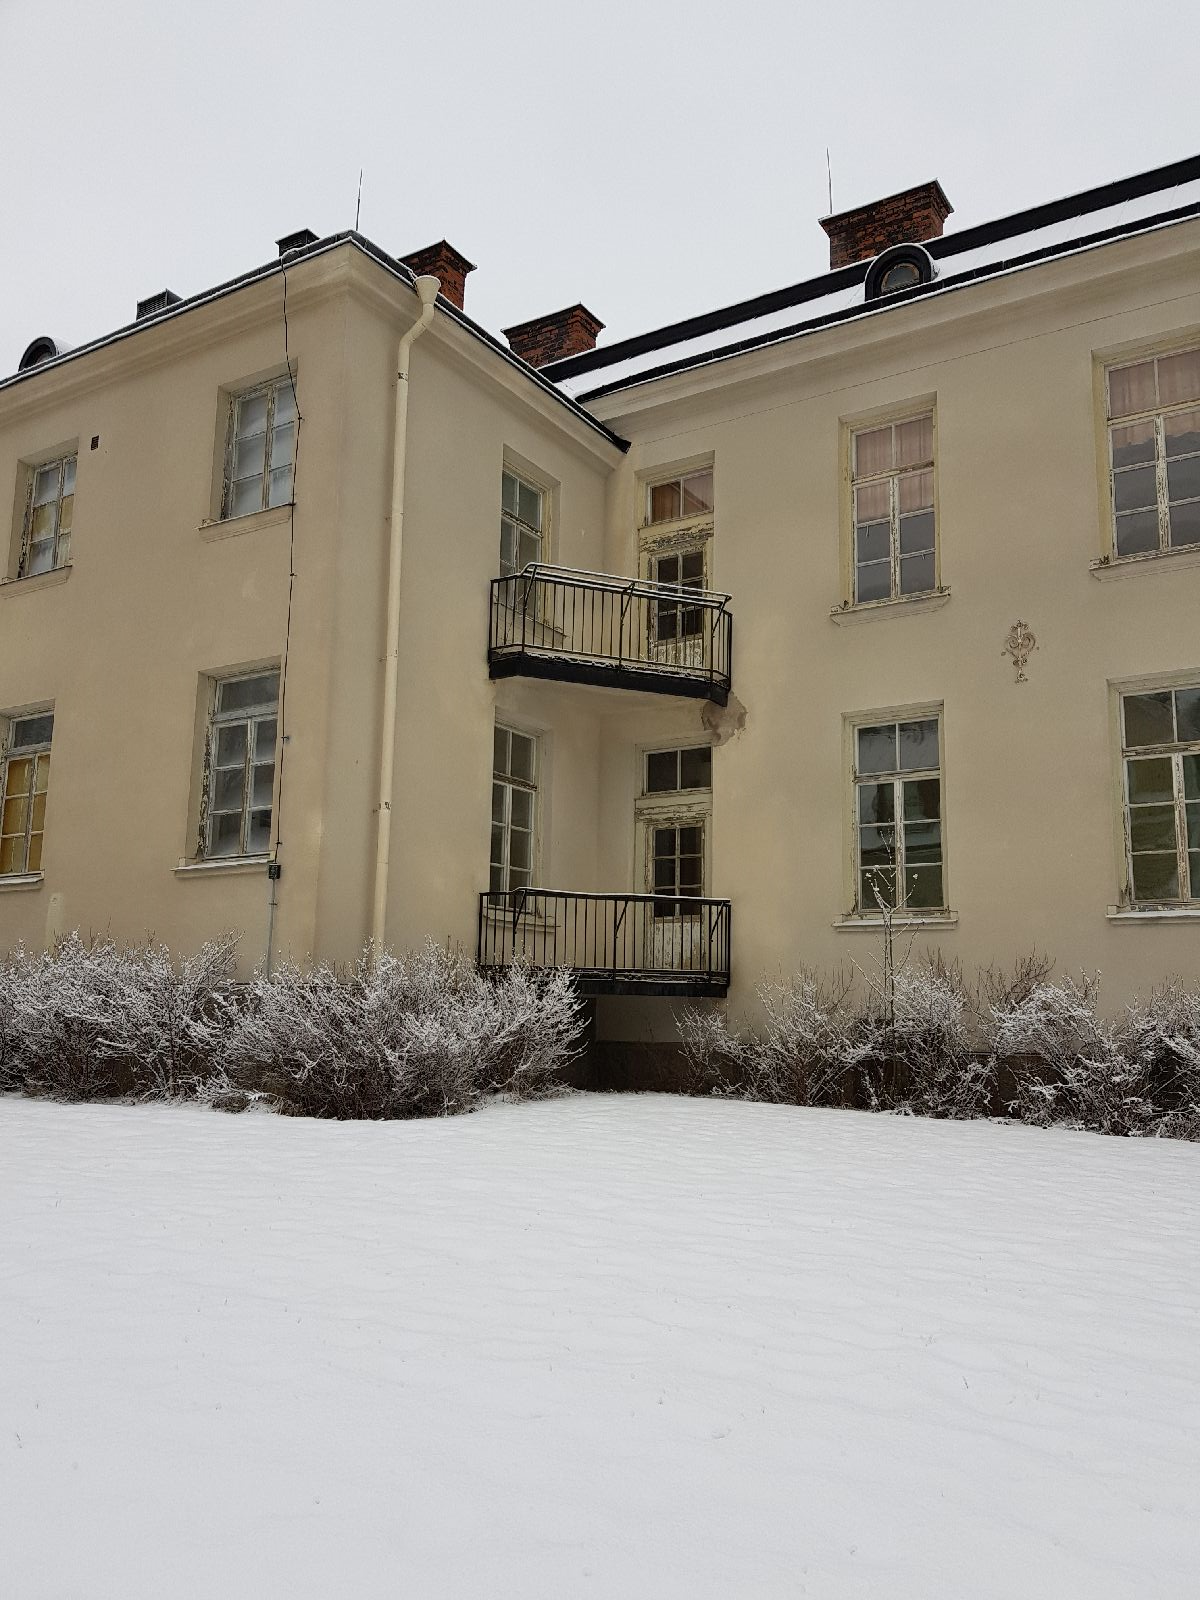 Hålahults sanatorium